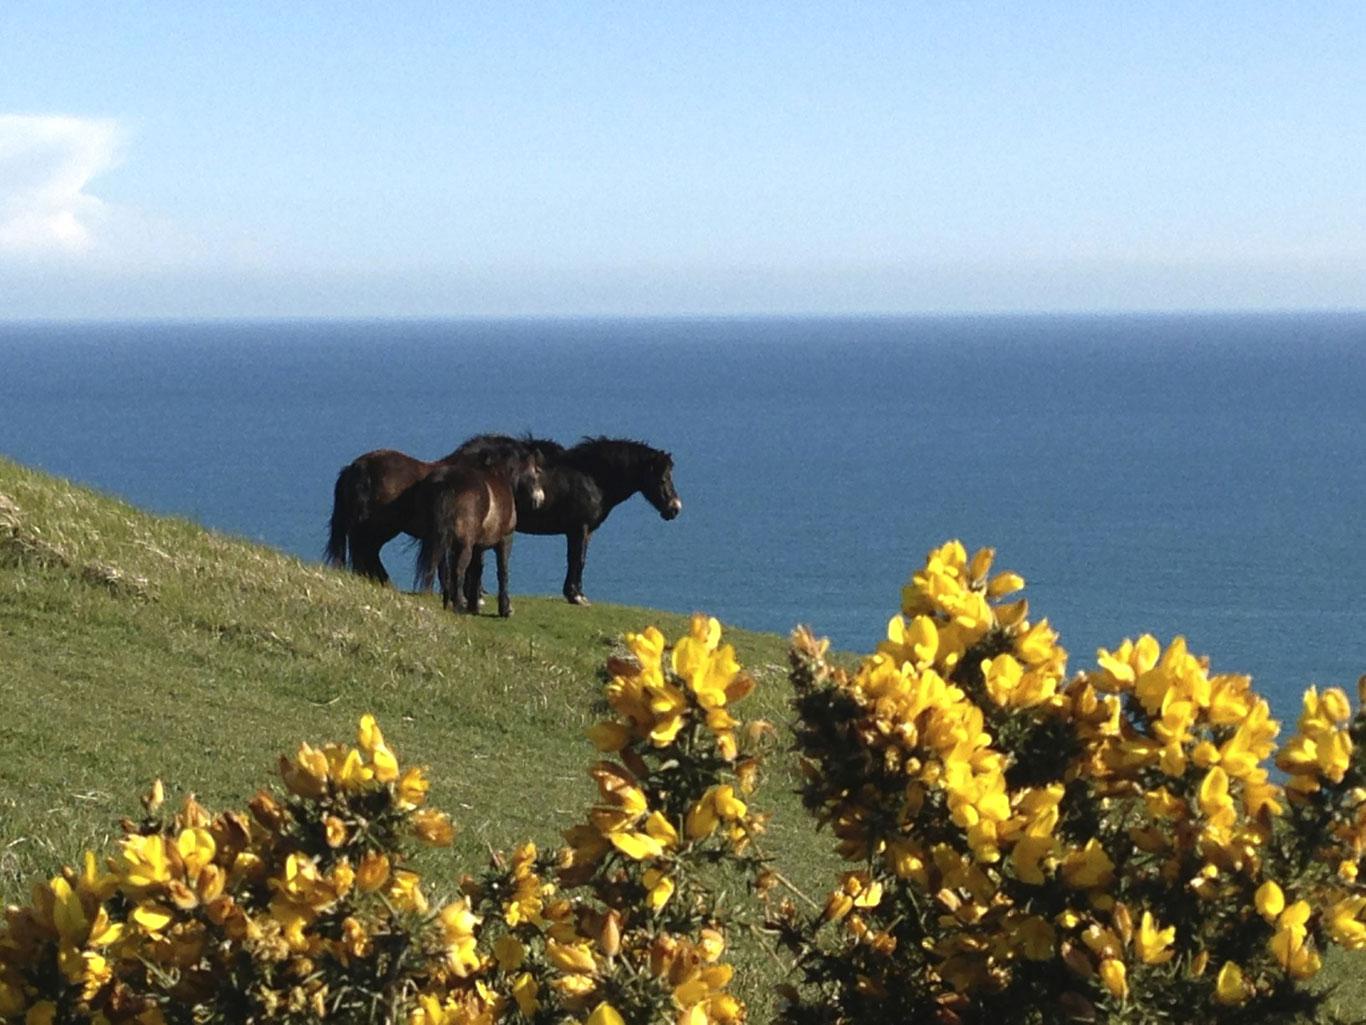 Bindon Hill horses